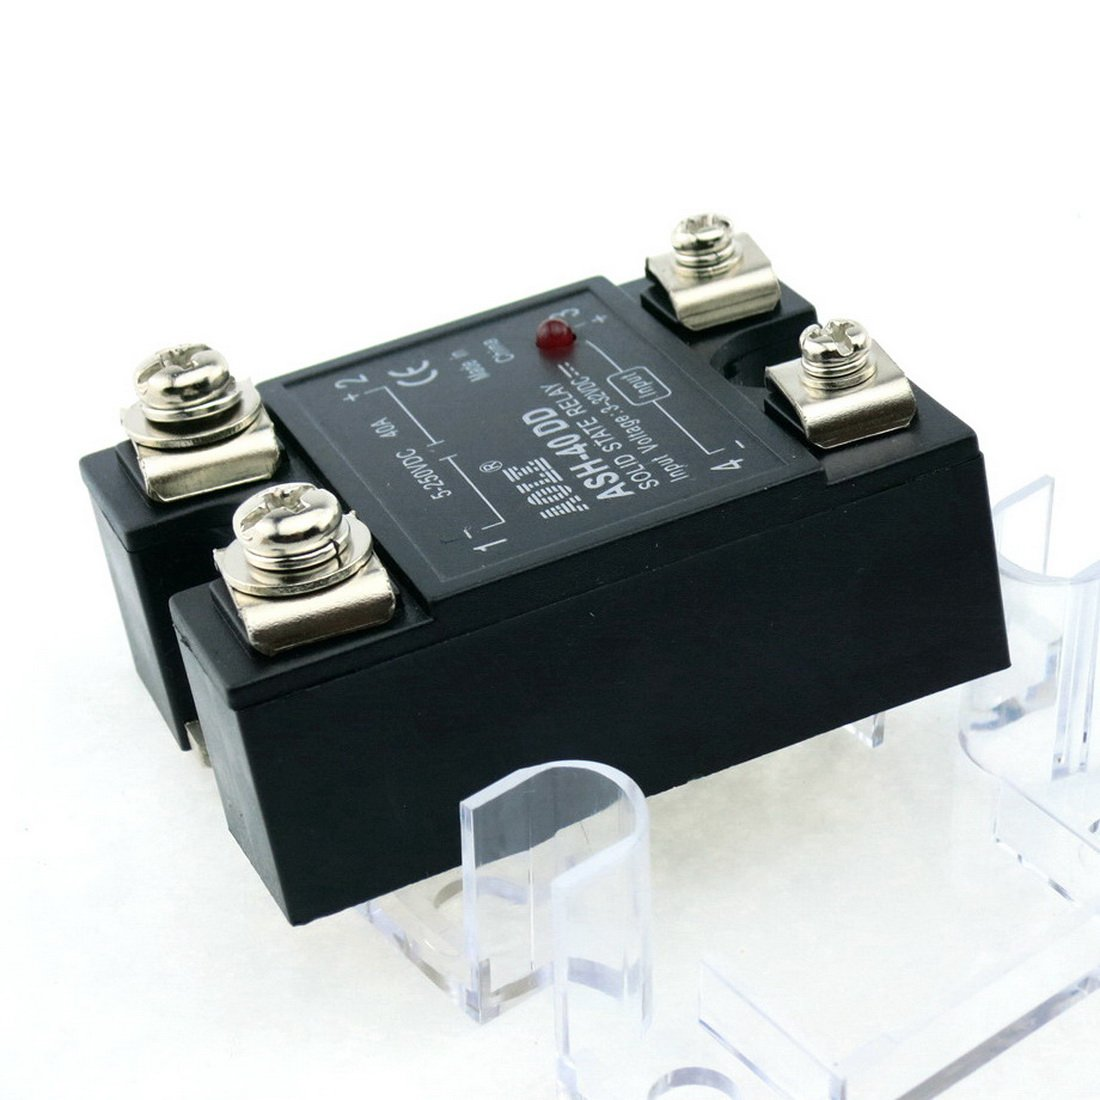 Werfamily Ssr Solid State Relay Dc 3 32v 5 250v Amazon Spdt 12v Industrial Scientific